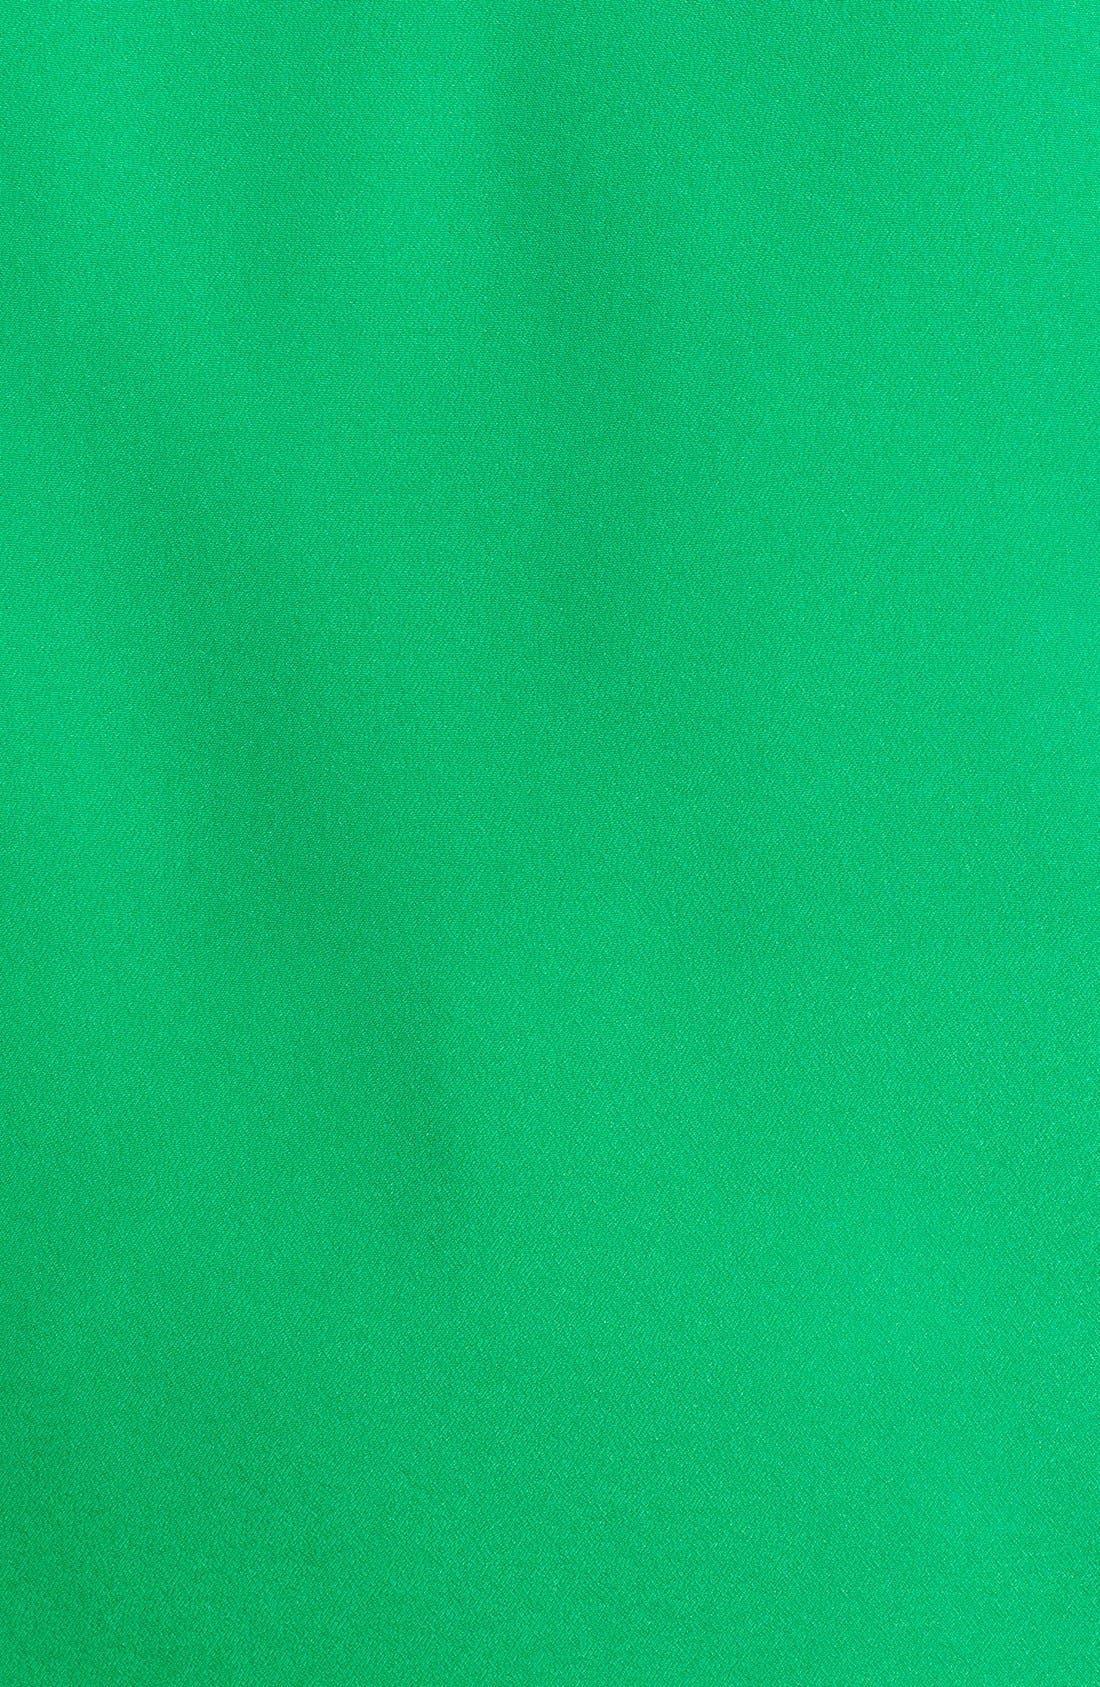 Alternate Image 3  - MICHAEL Michael Kors 'Dogtag Zip' Campshirt